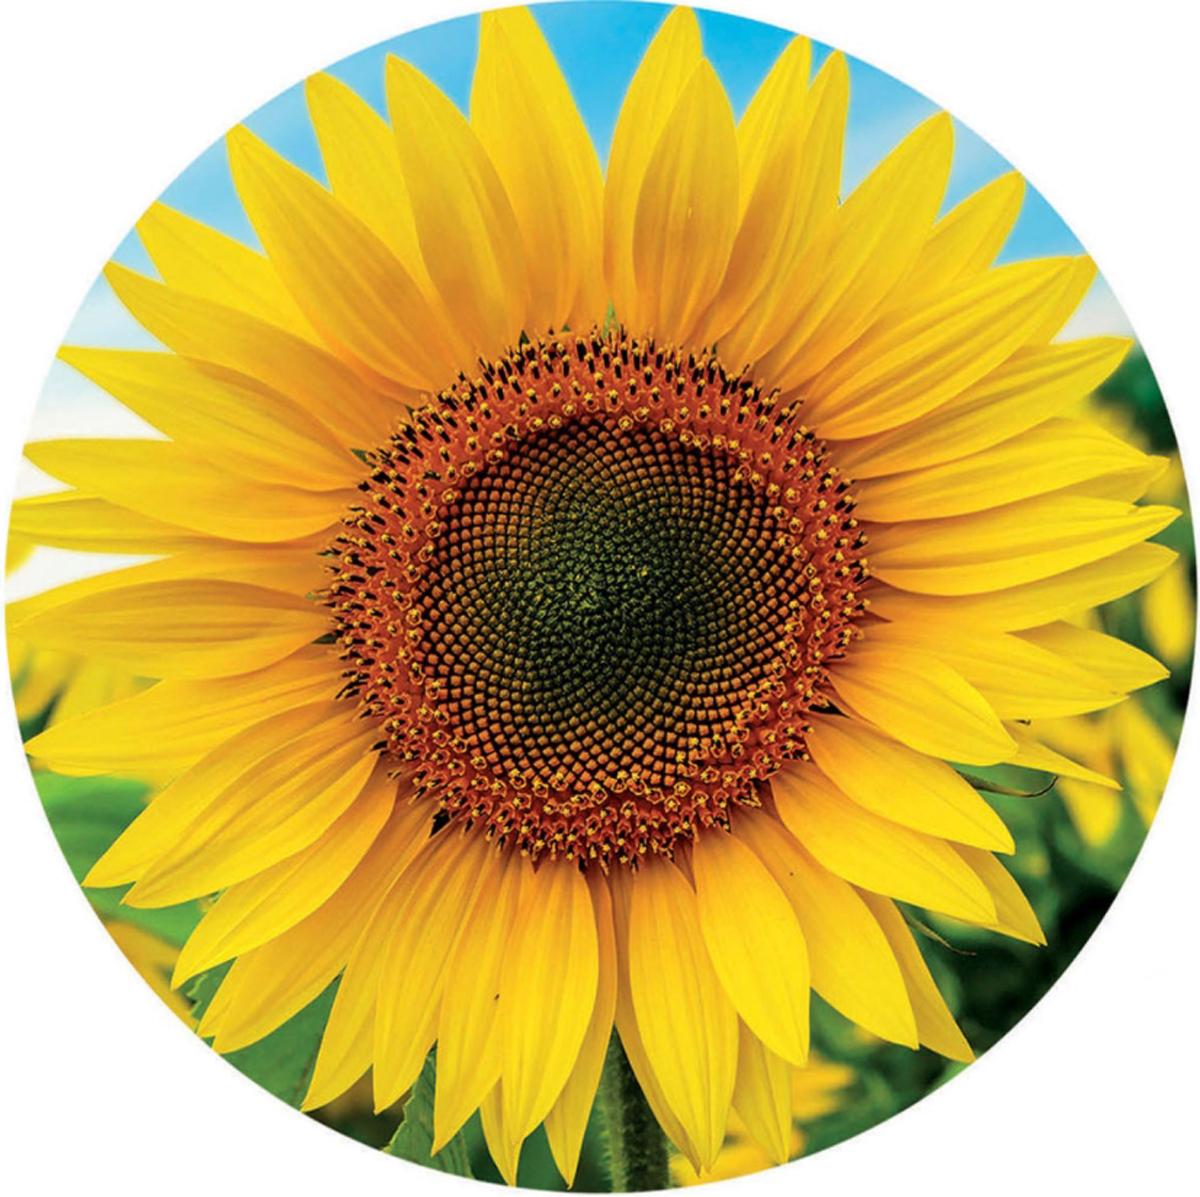 Sunflower Flowers Jigsaw Puzzle